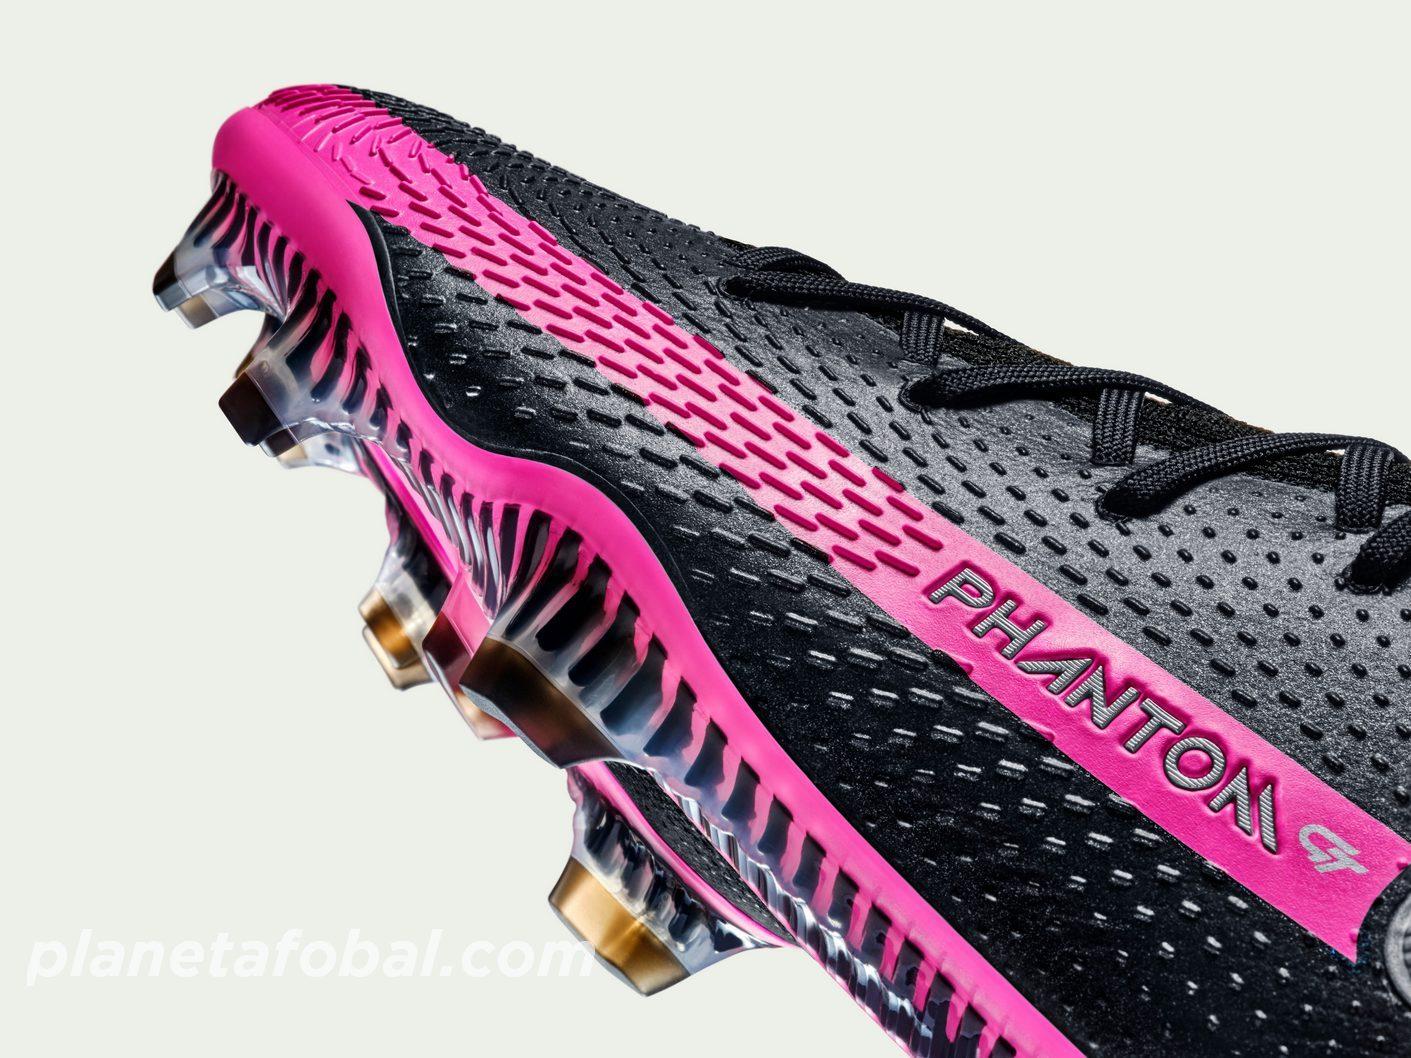 Nuevos botines Phantom GT | Imagen Nike